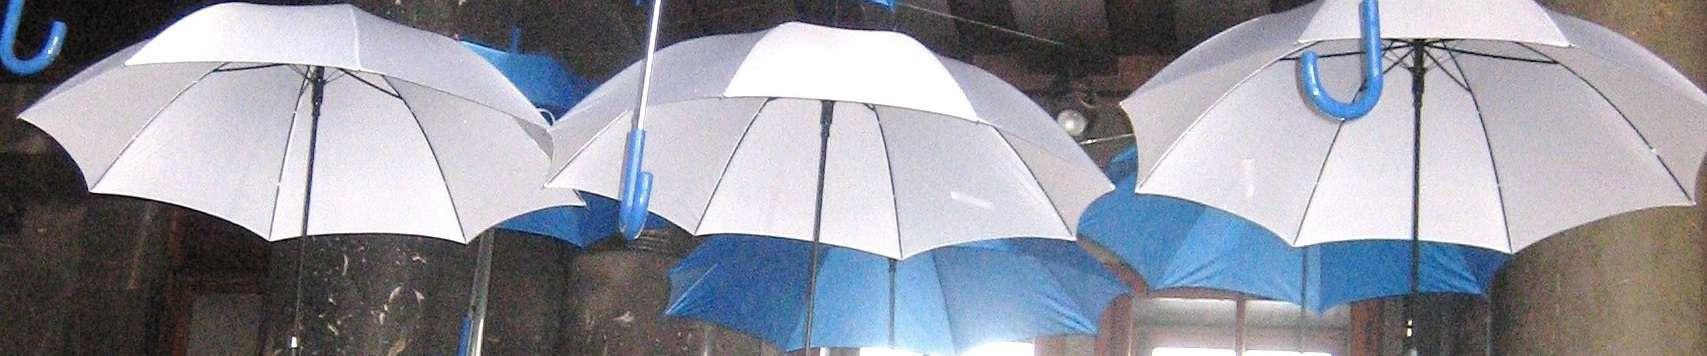 paraplu's wit 2